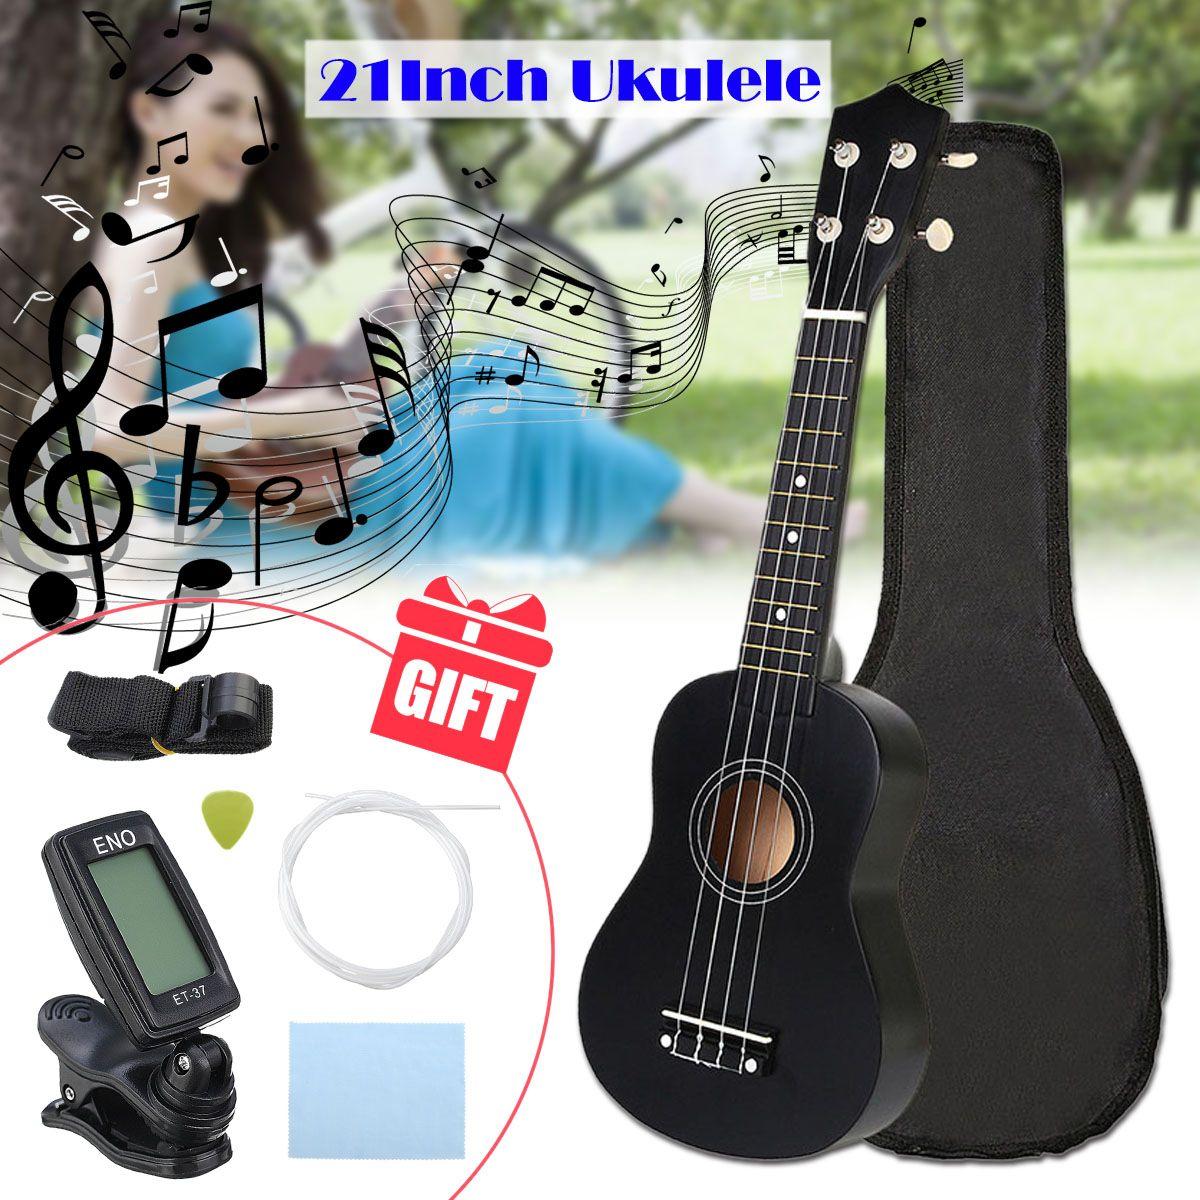 Zebra 21 polegada 4 Cordas Soprano Ukelele Havaiano Basswood Spruce Guitarra Instrumento Musical Definido Kits + Tuner + Corda + cinta + Saco